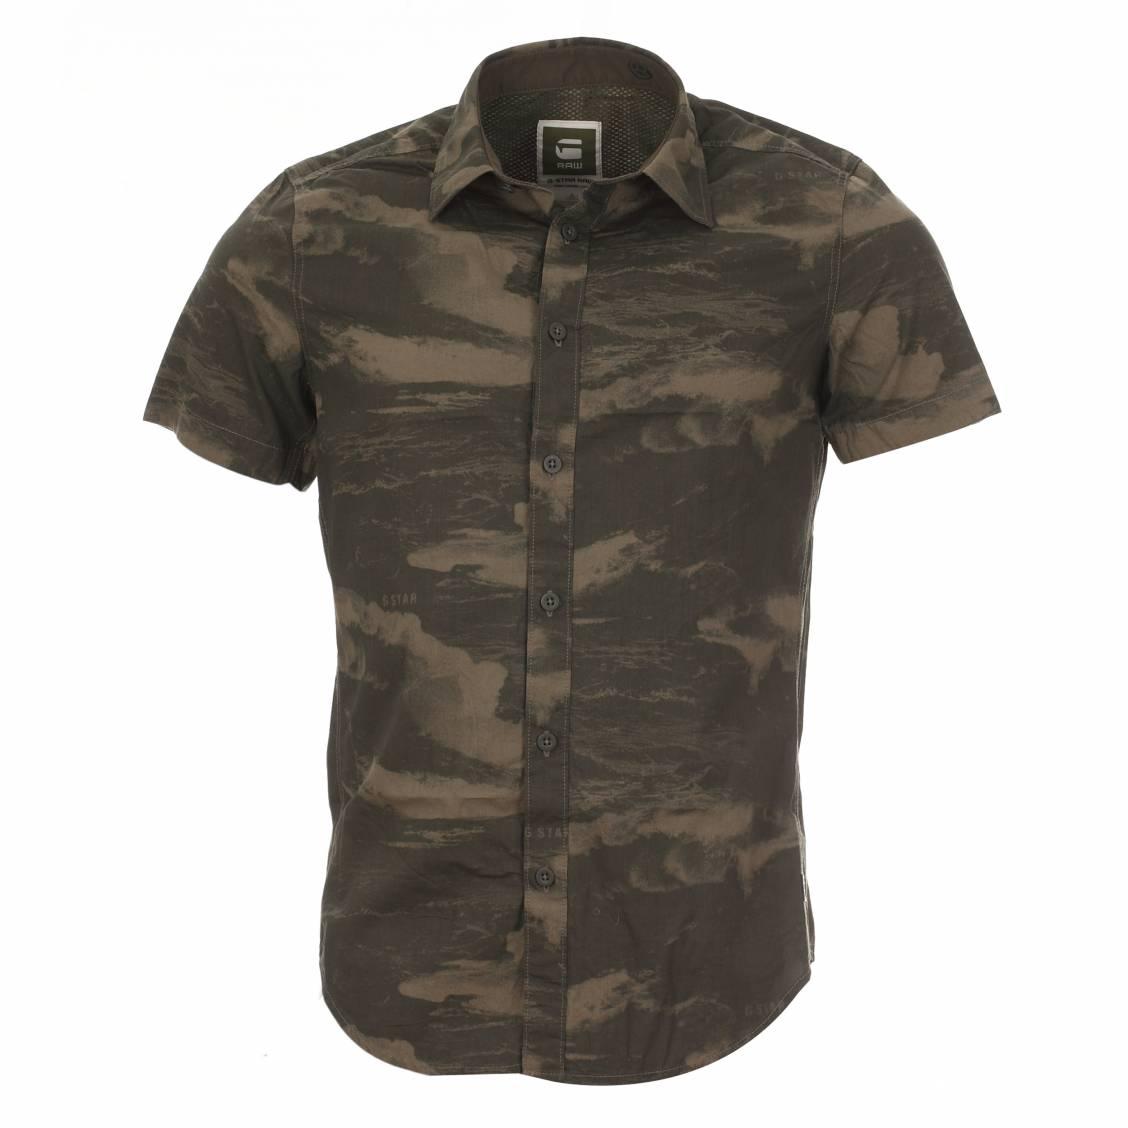 chemise homme manches courtes troupman g star camouflage rue des hommes. Black Bedroom Furniture Sets. Home Design Ideas